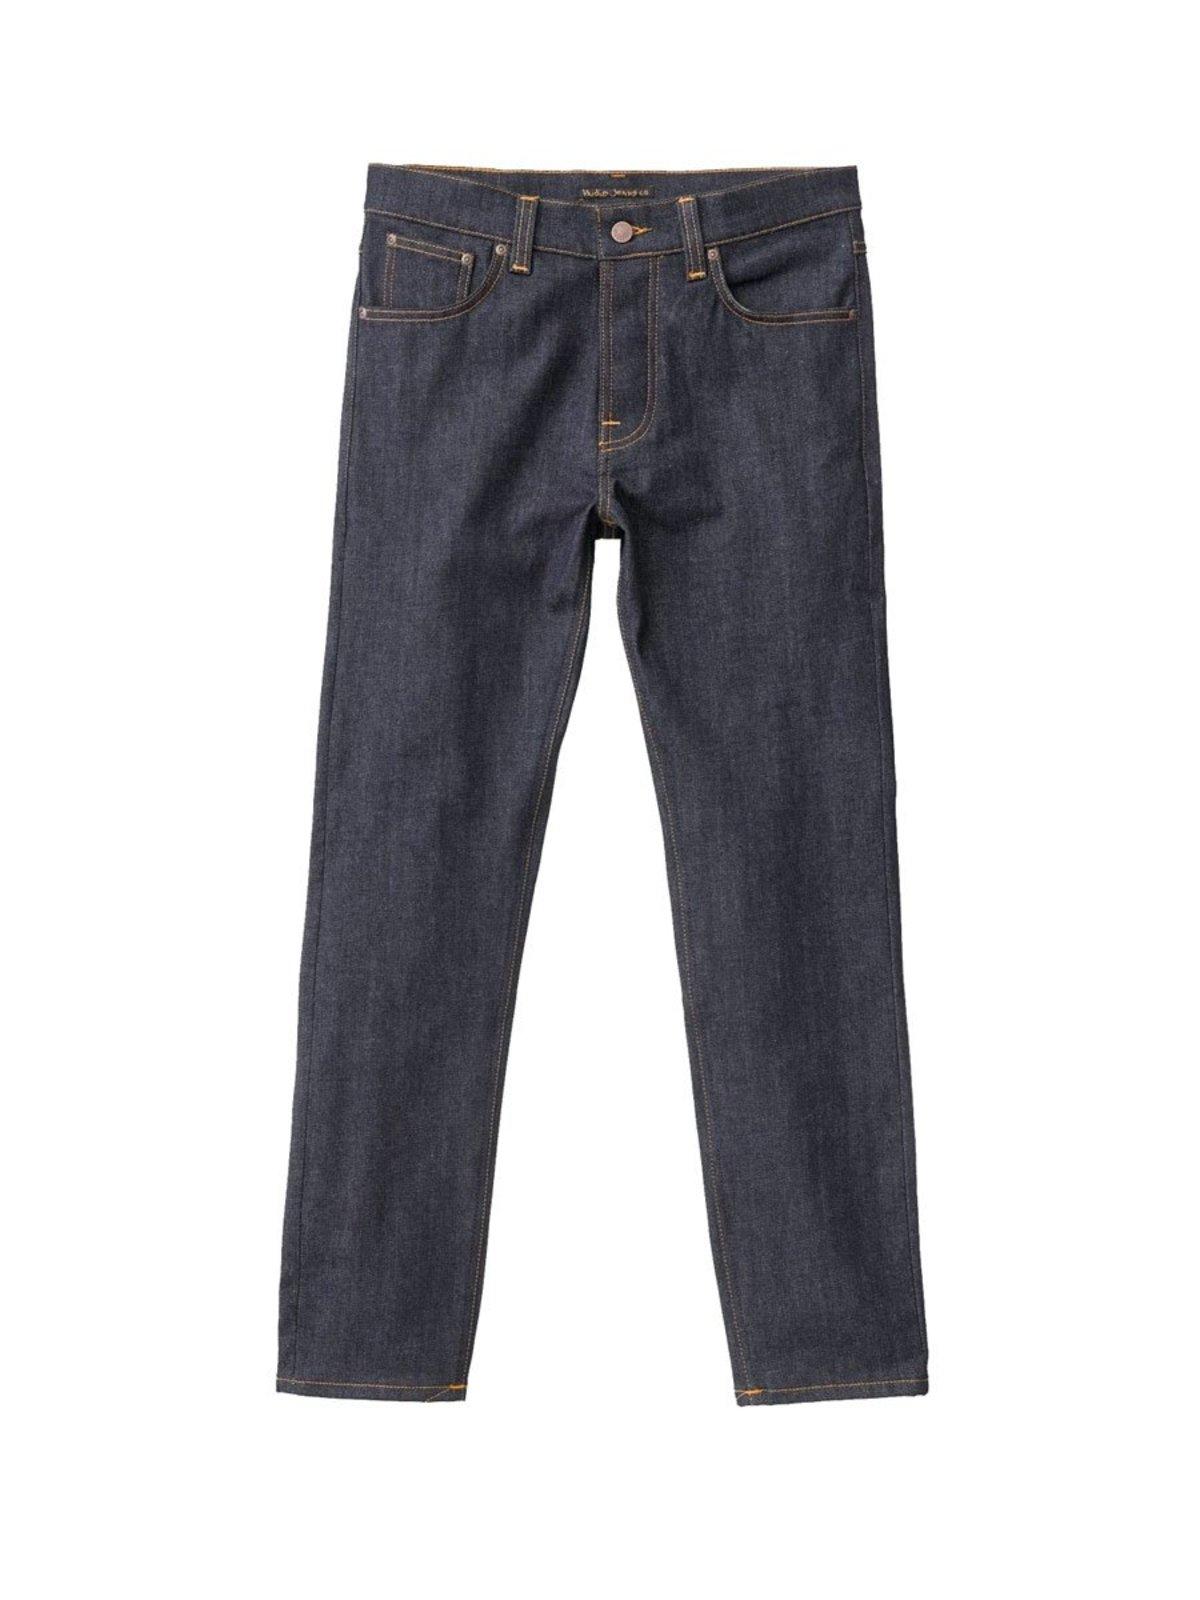 Nudie Men/'s Jeans Trousers Regular Tapered Fit Blue,Black Small Error